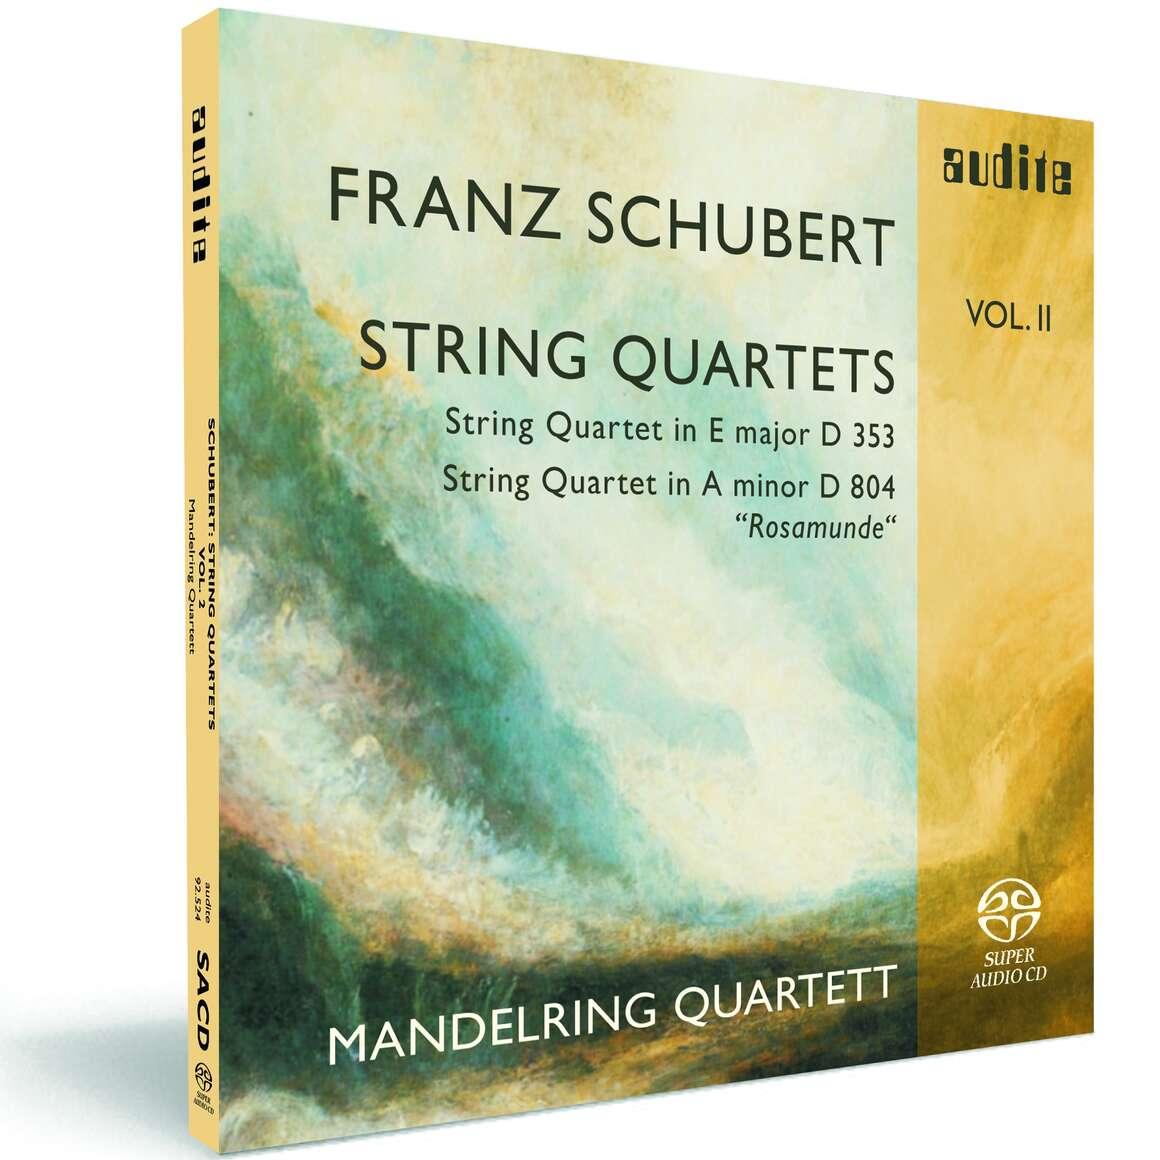 F. Schubert: String Quartets Vol. II